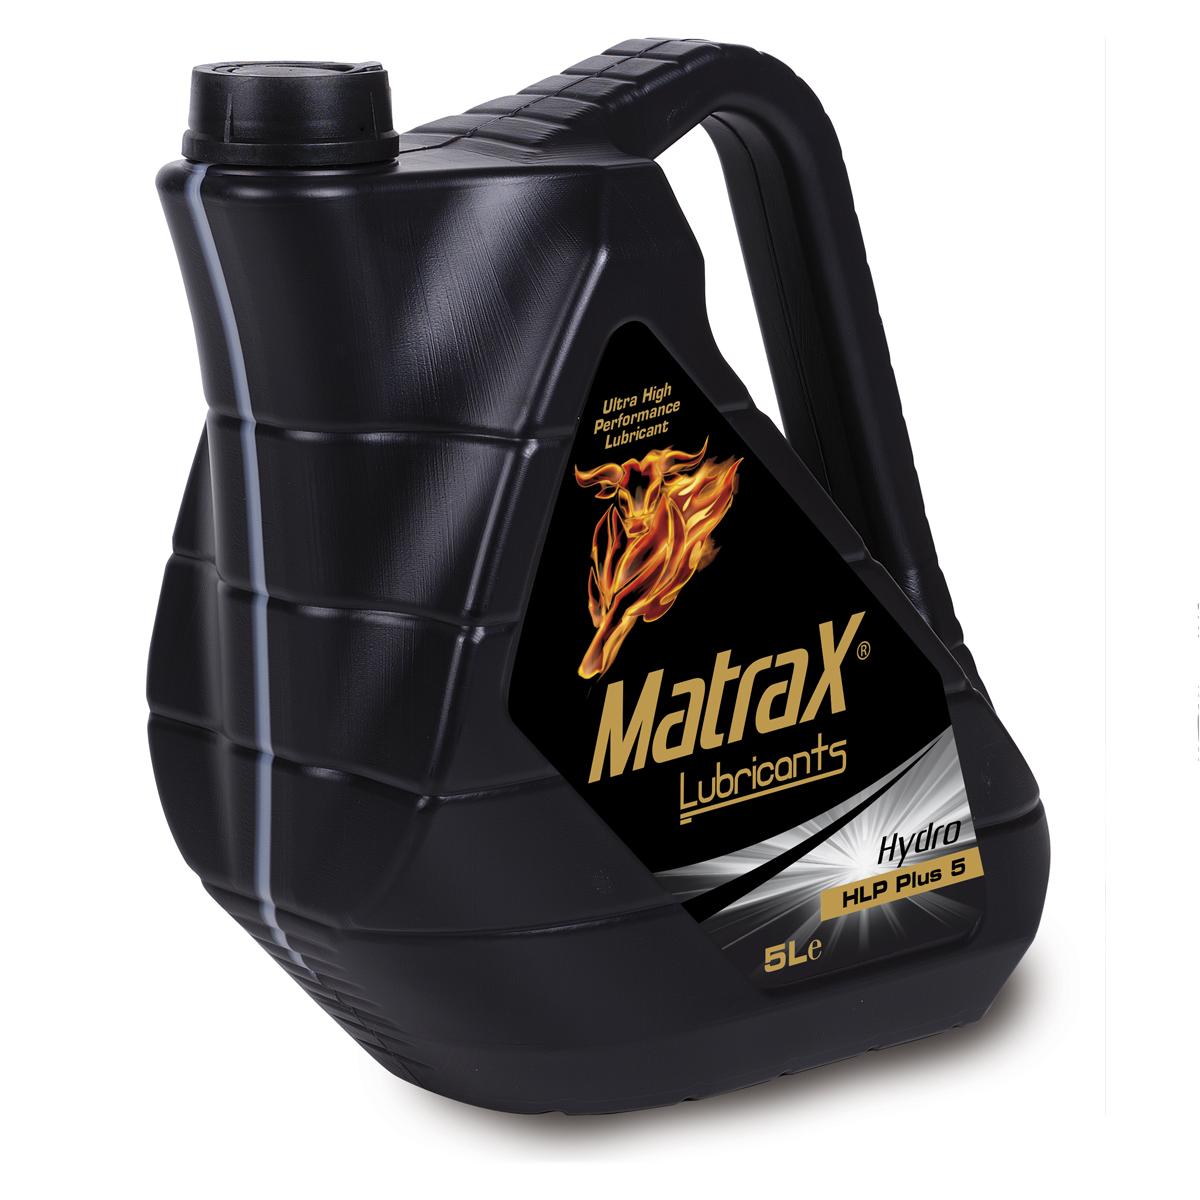 MatraX Hydro HLP Plus 5